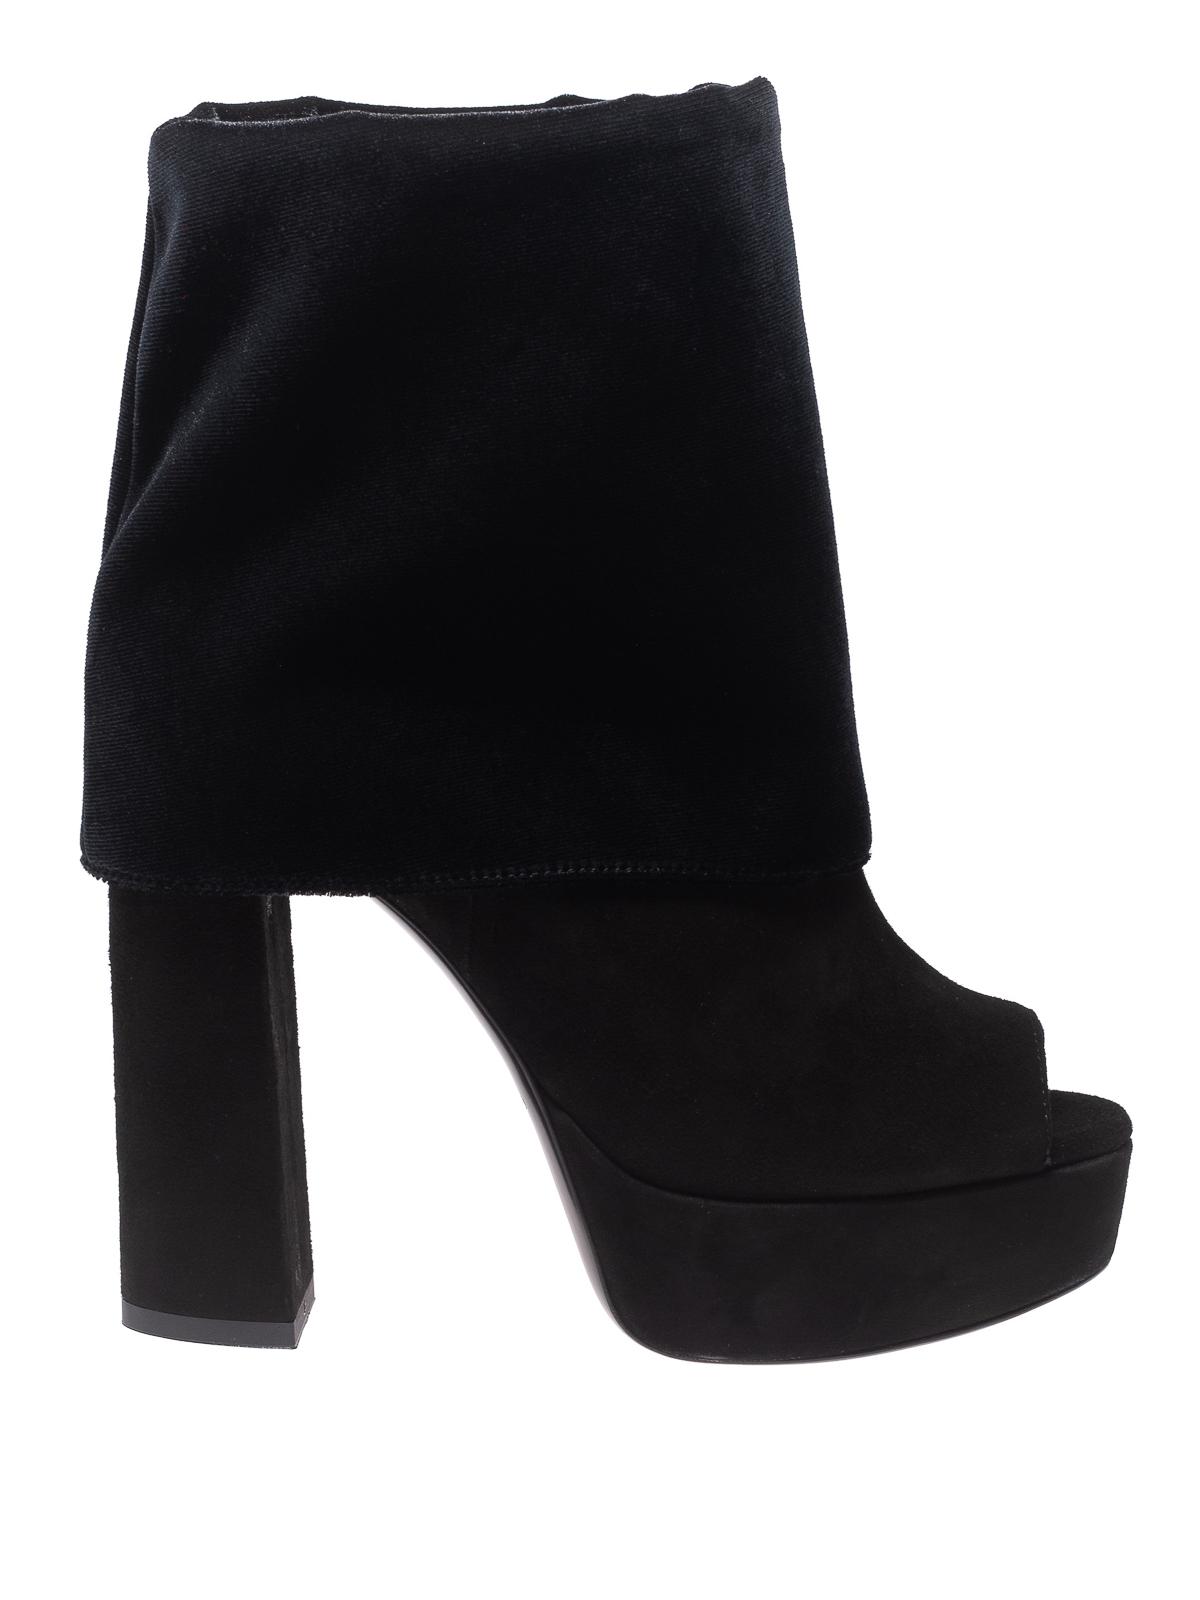 black platform peep toe booties